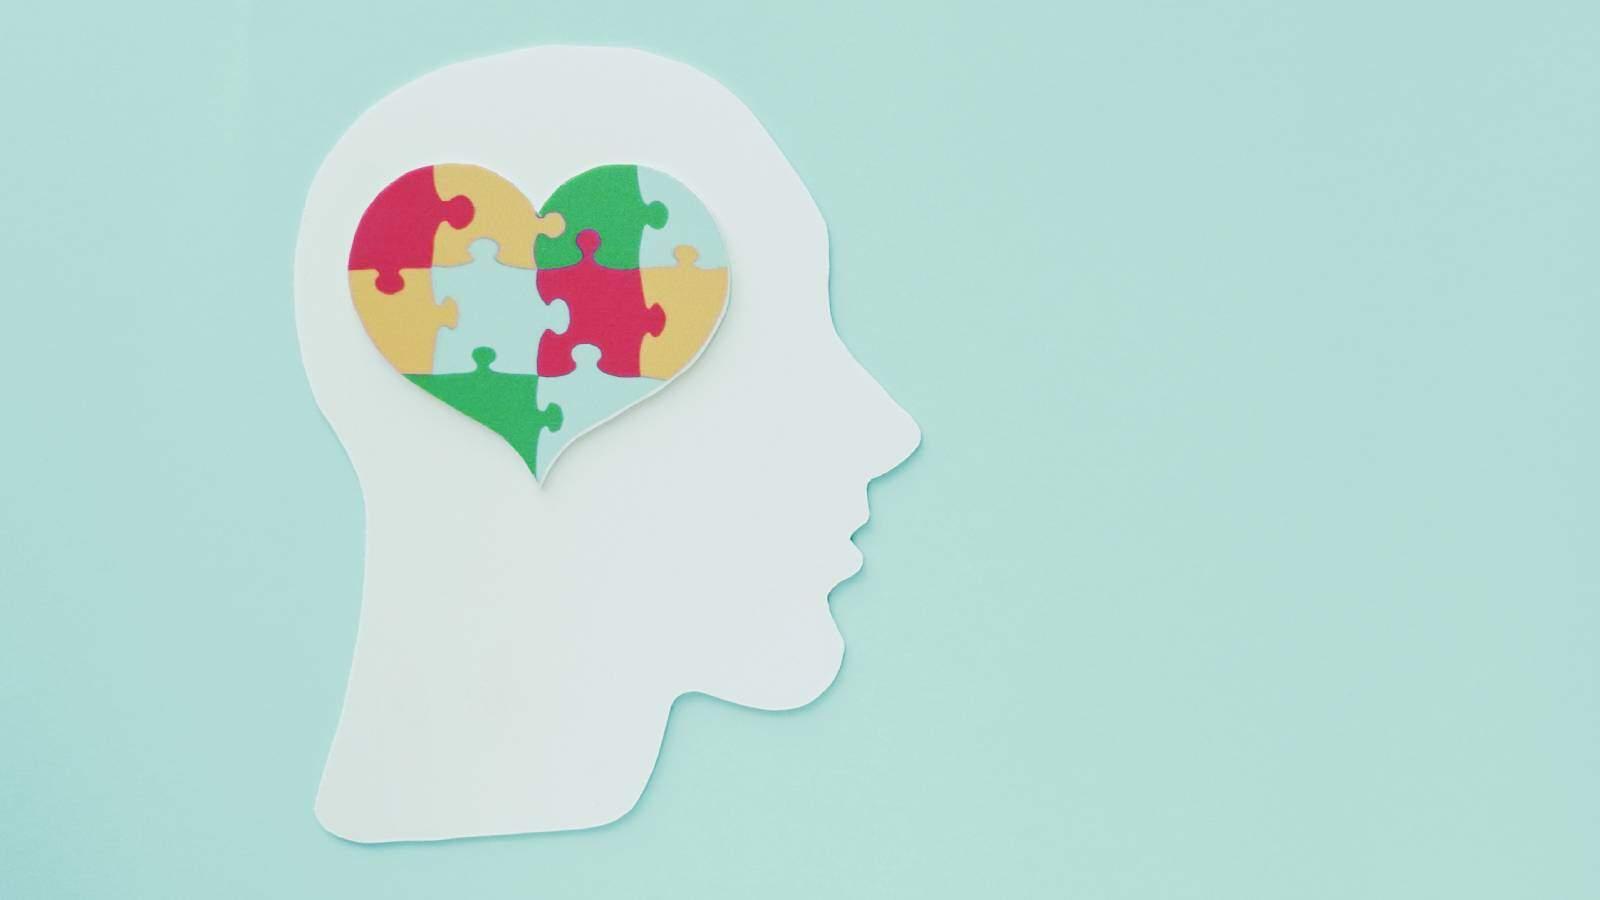 CBD לטיפול באוטיזם | קנאביס רפואי בריא בישראל